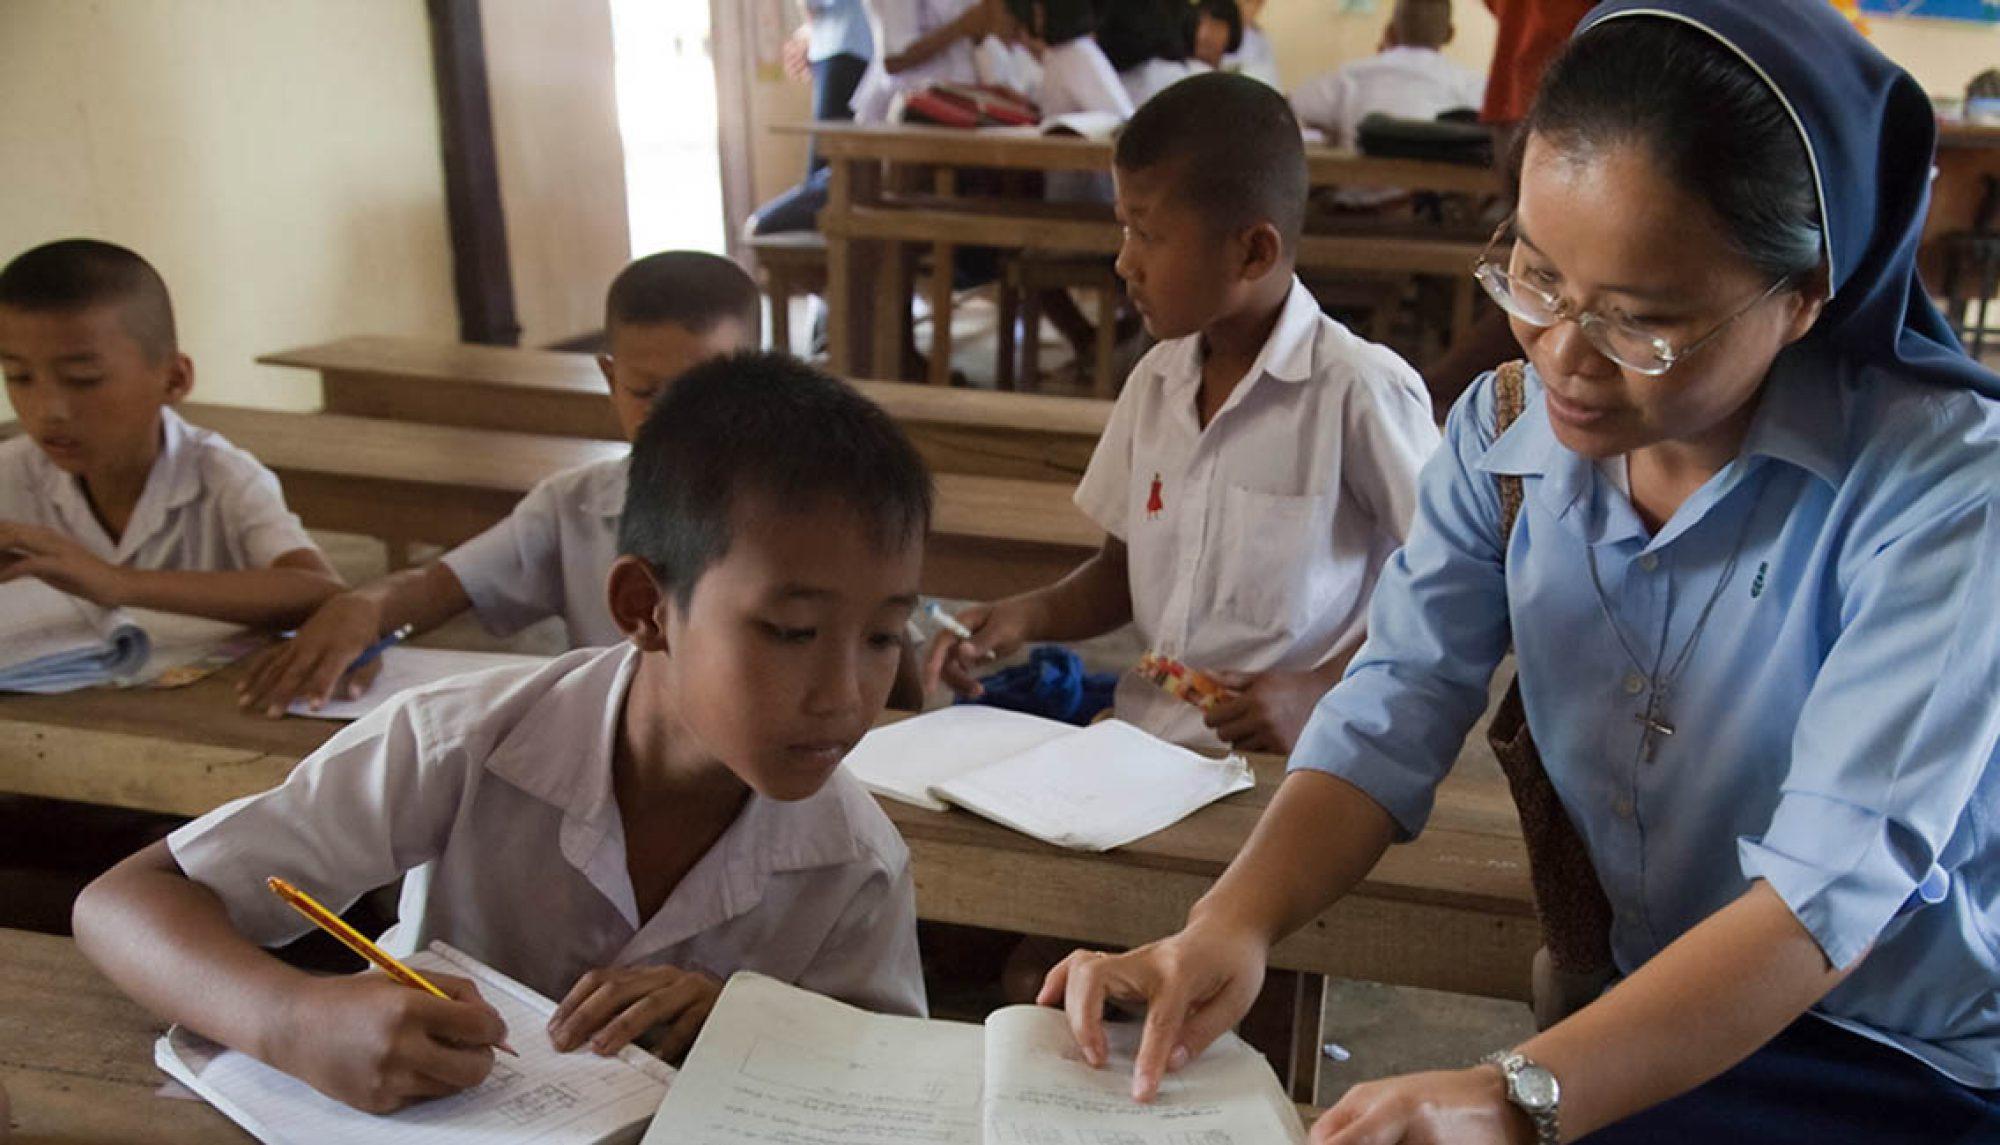 Nun mentoring a student in a training center for Burmese children in Thailand.